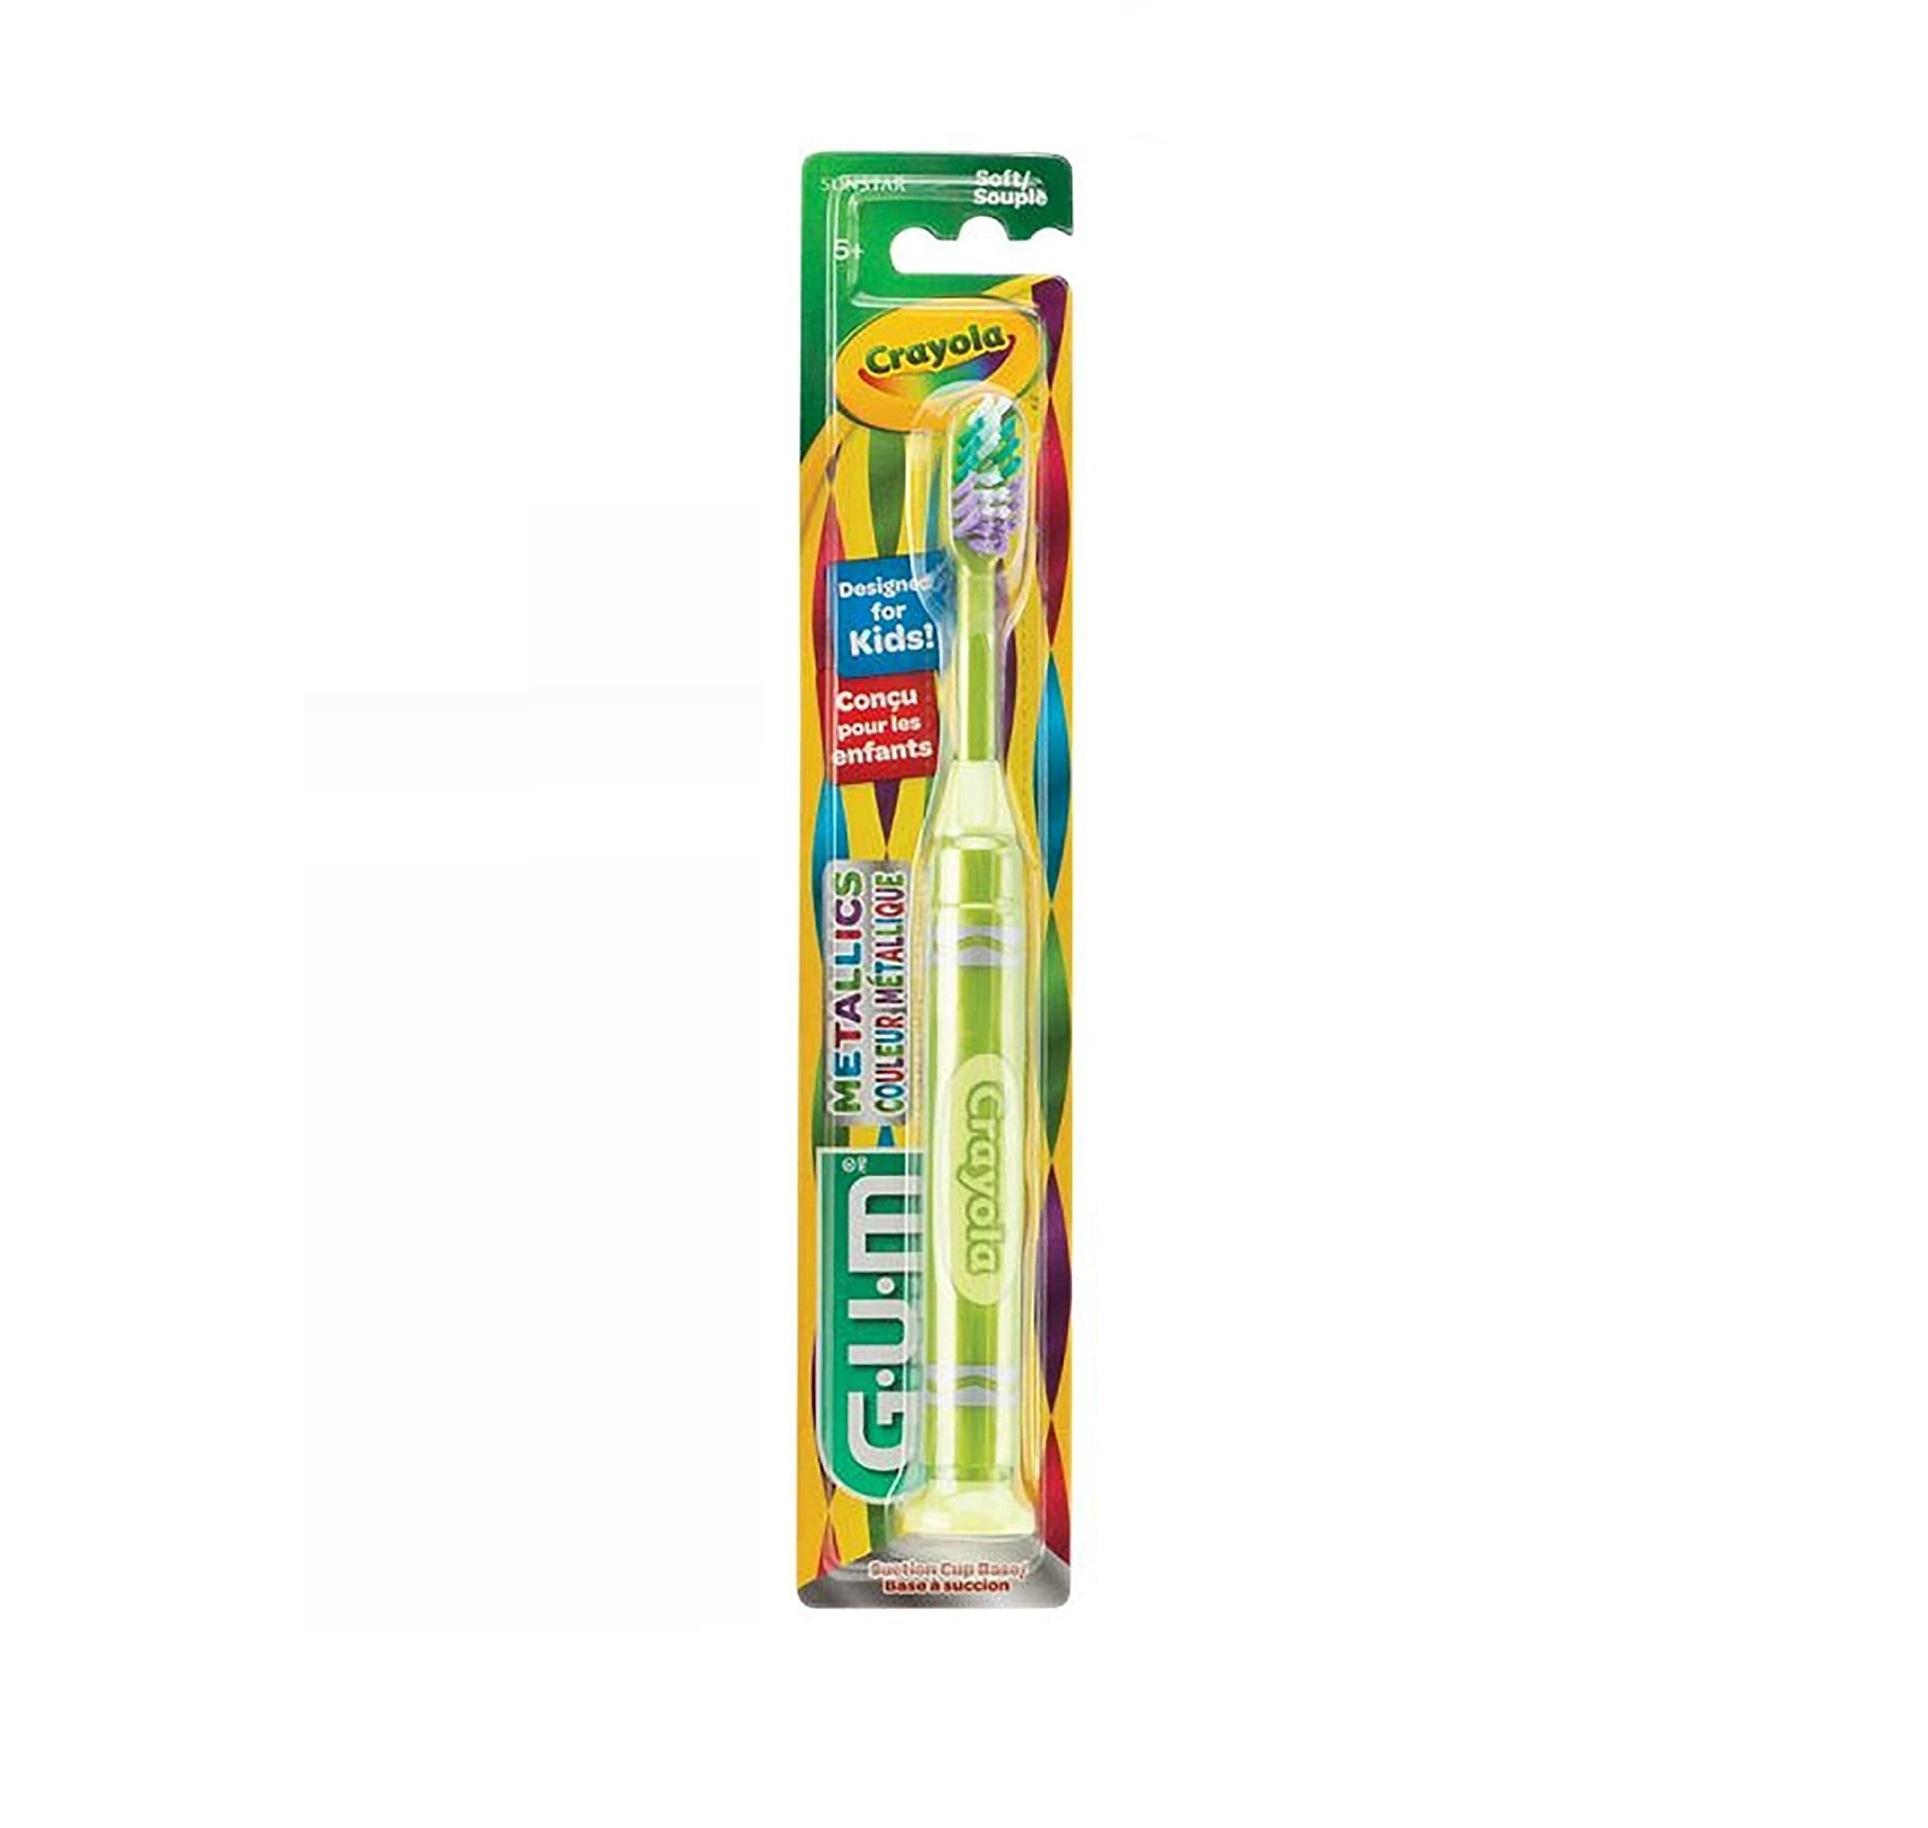 Cepillo Crayola Colores metálicos